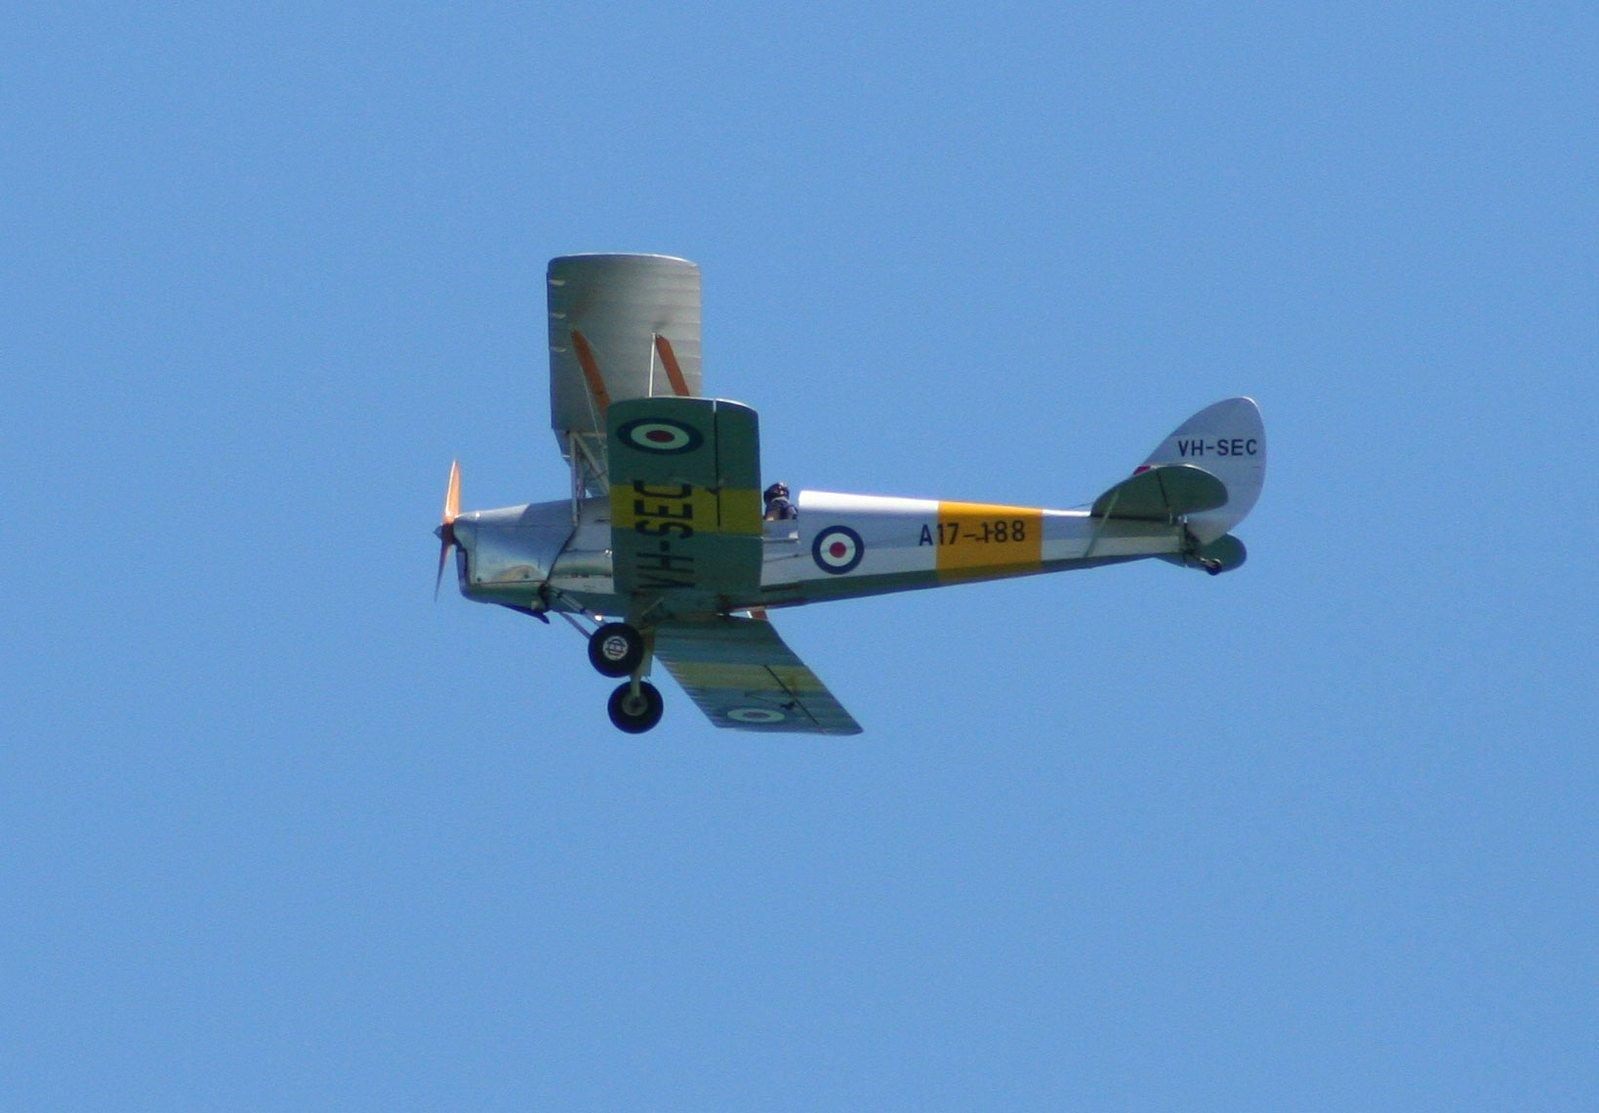 Bi-plane,plane,aeroplane,vehicle